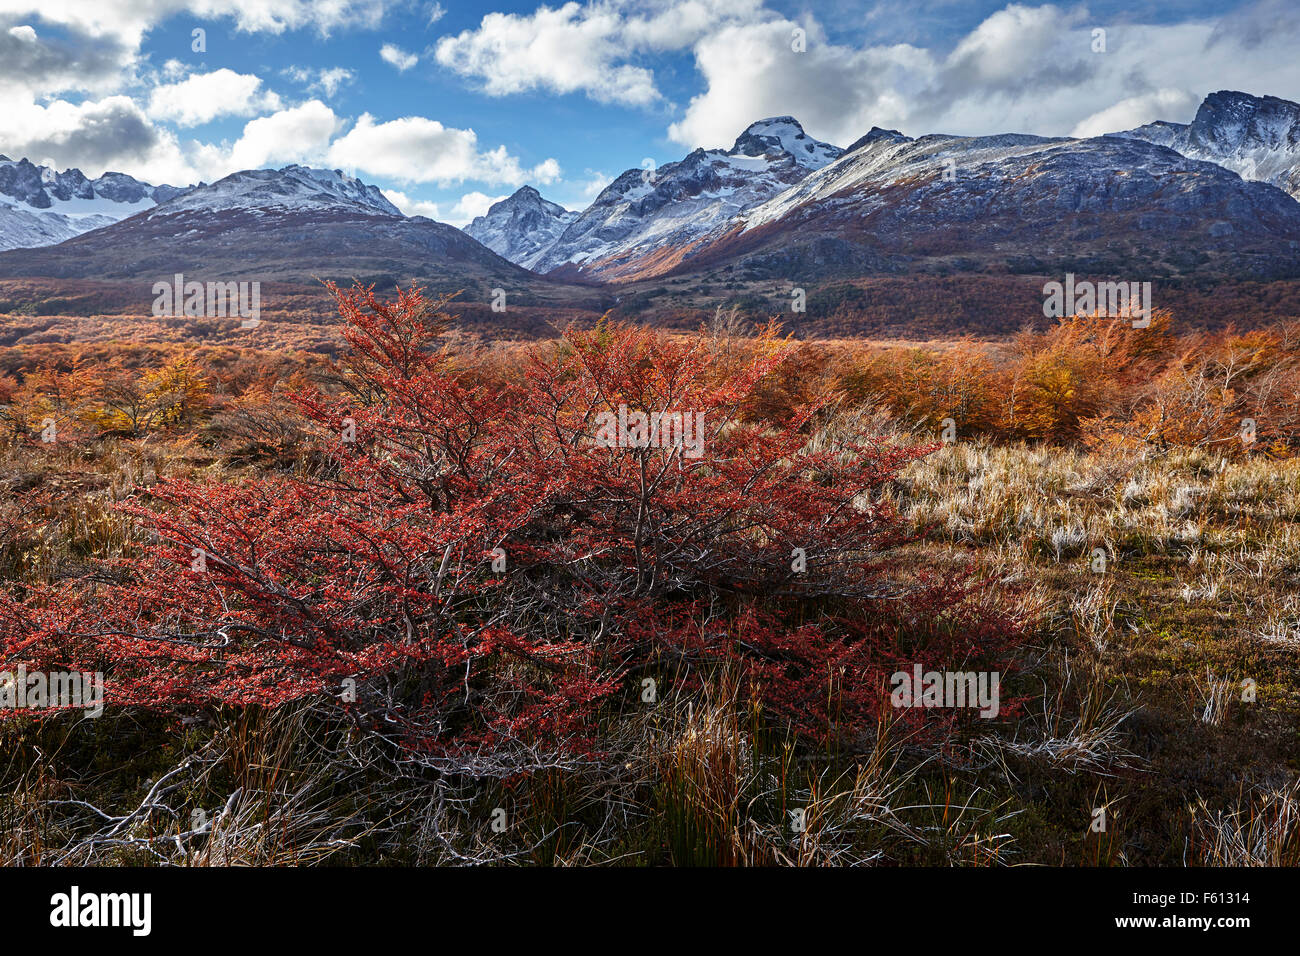 Mountains, Sierra Alvear, Valle Tierra Mayor, Tierra del Fuego National Park, Argentina - Stock Image